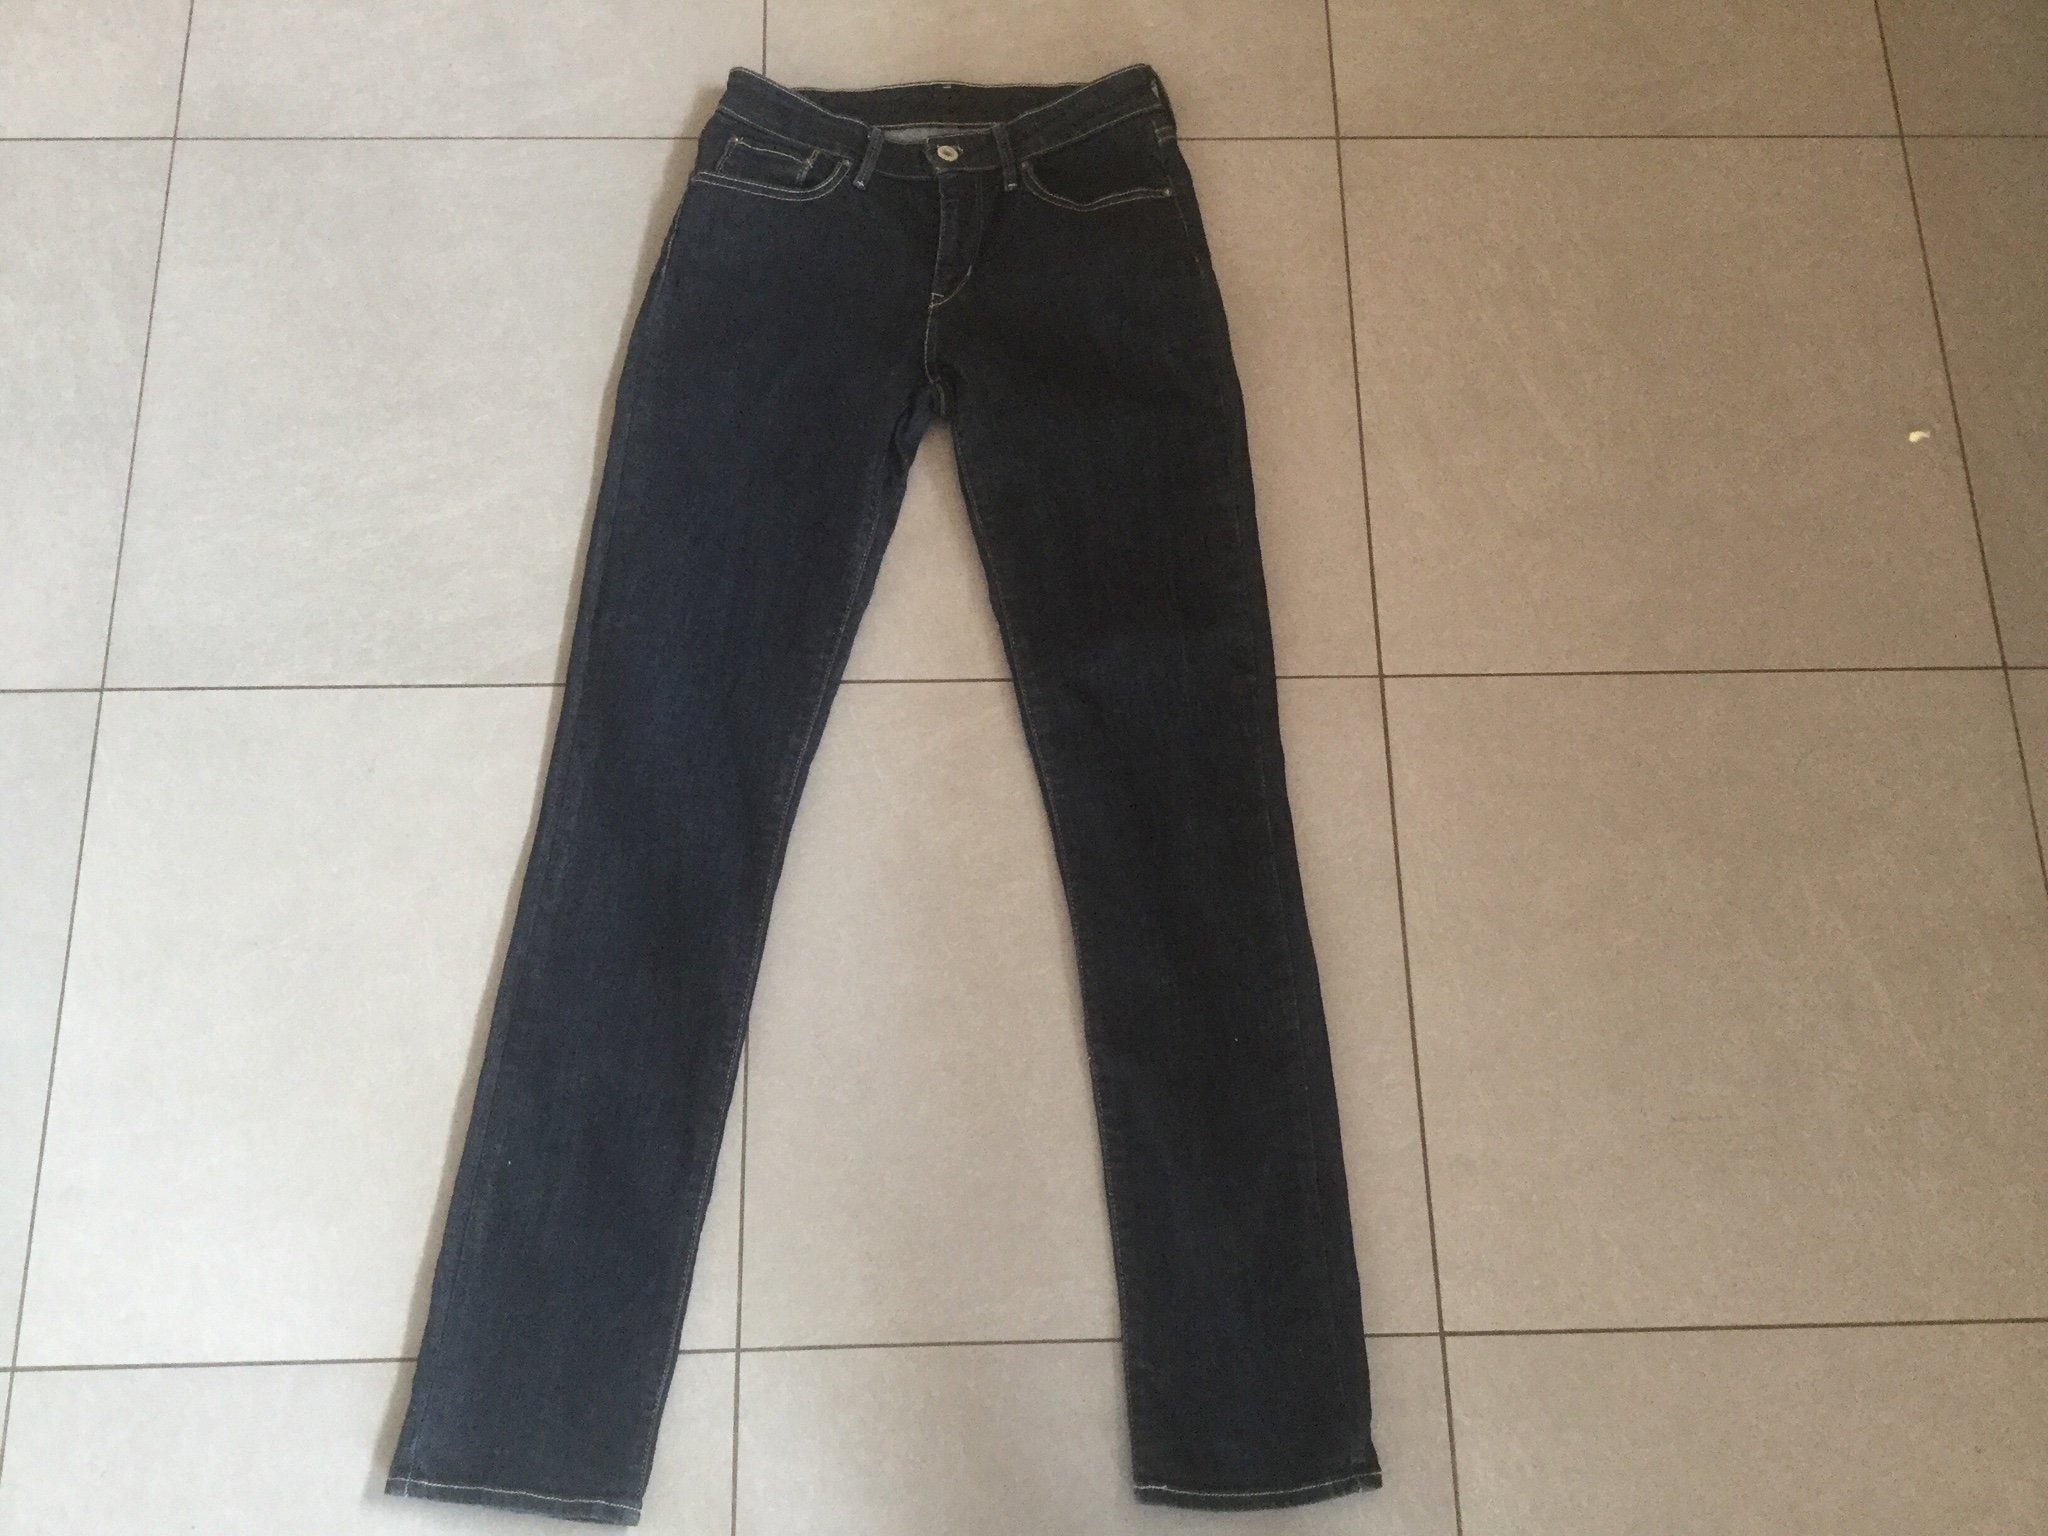 32c9aec5333 Levis jeans blå strl W27L34 (350423936) ᐈ Köp på Tradera